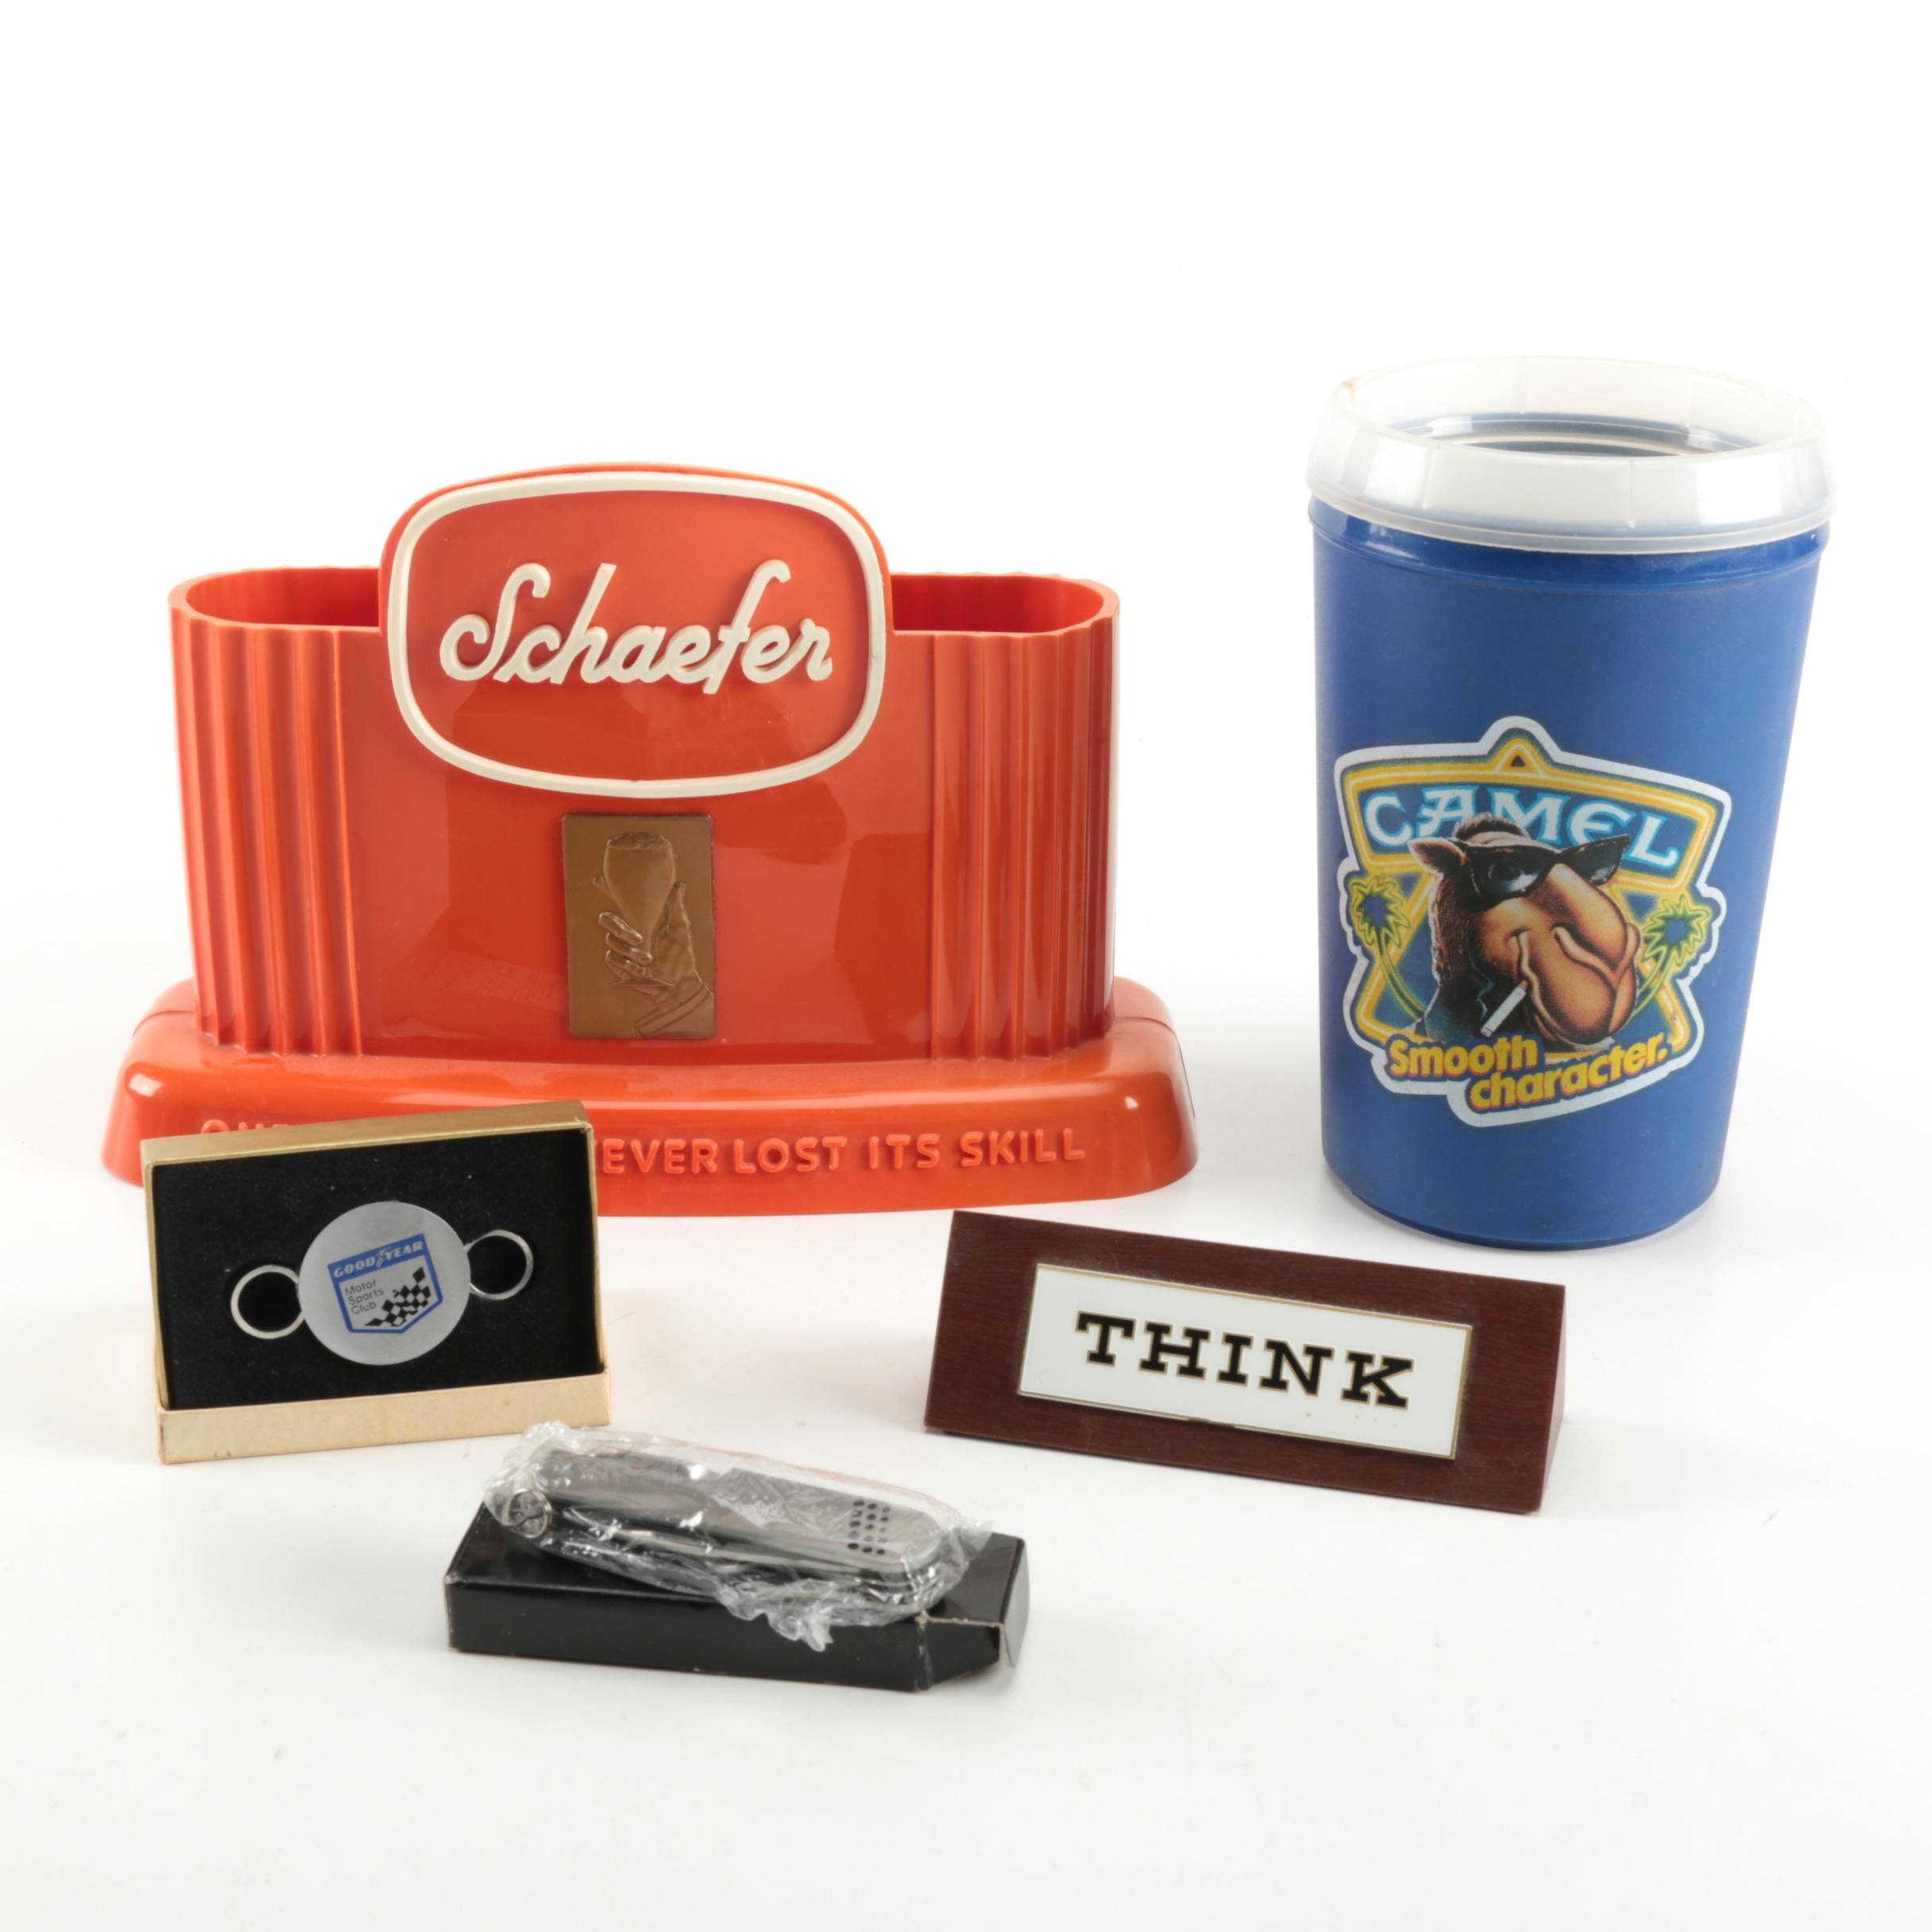 Assortment of Beer and Smoking Memorabilia